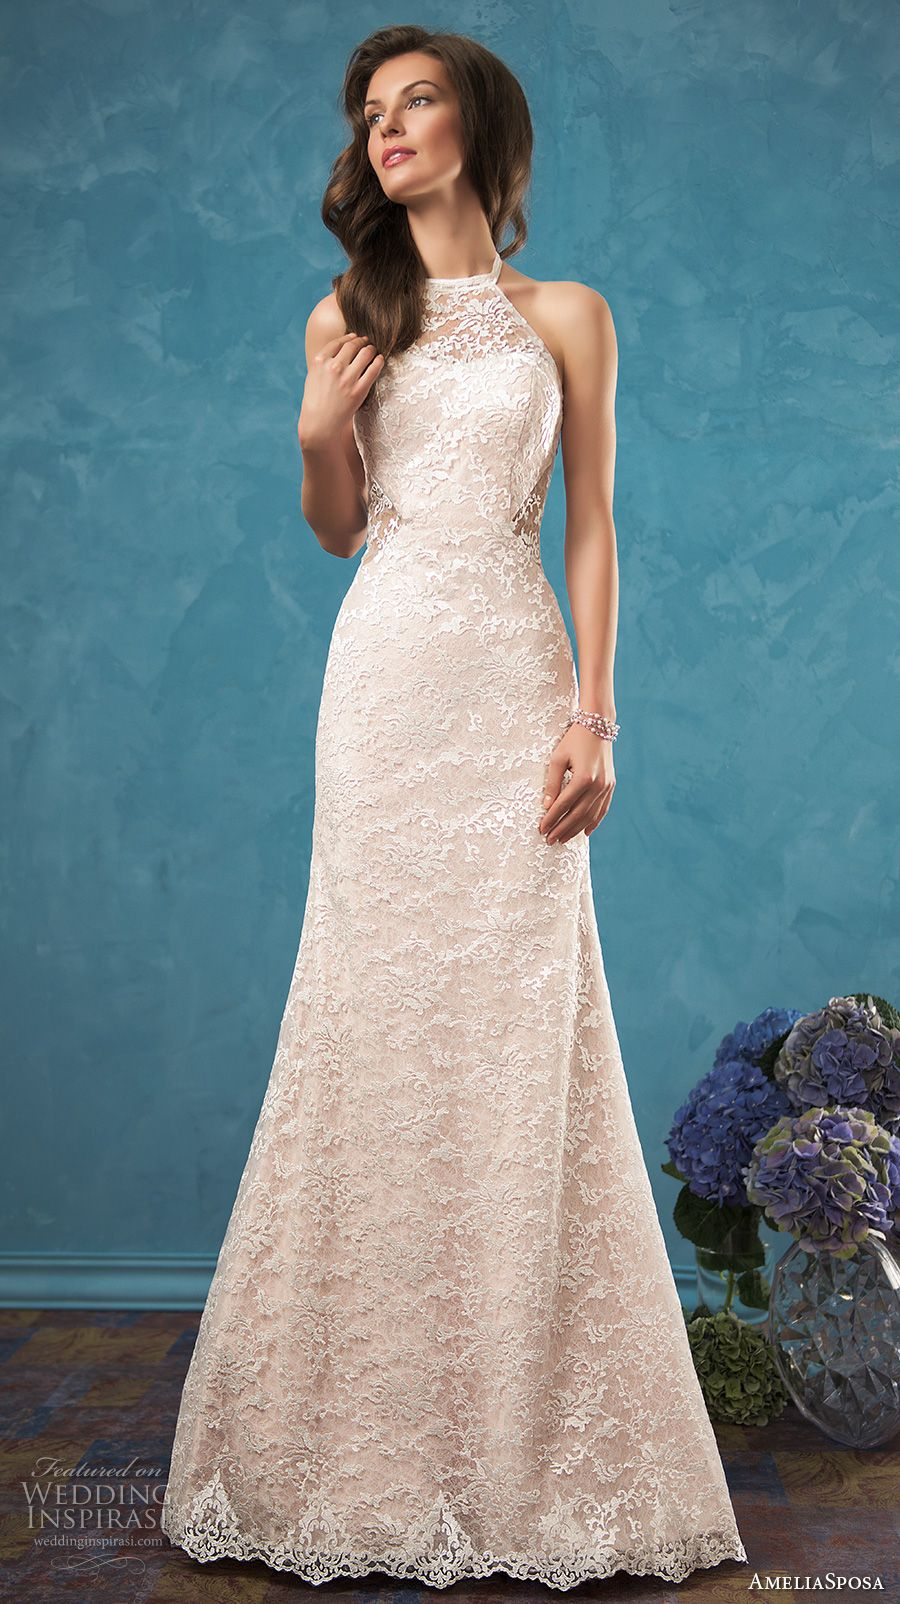 Amelia Sposa 2017 Wedding Dresses   Amelia sposa, Color wedding ...